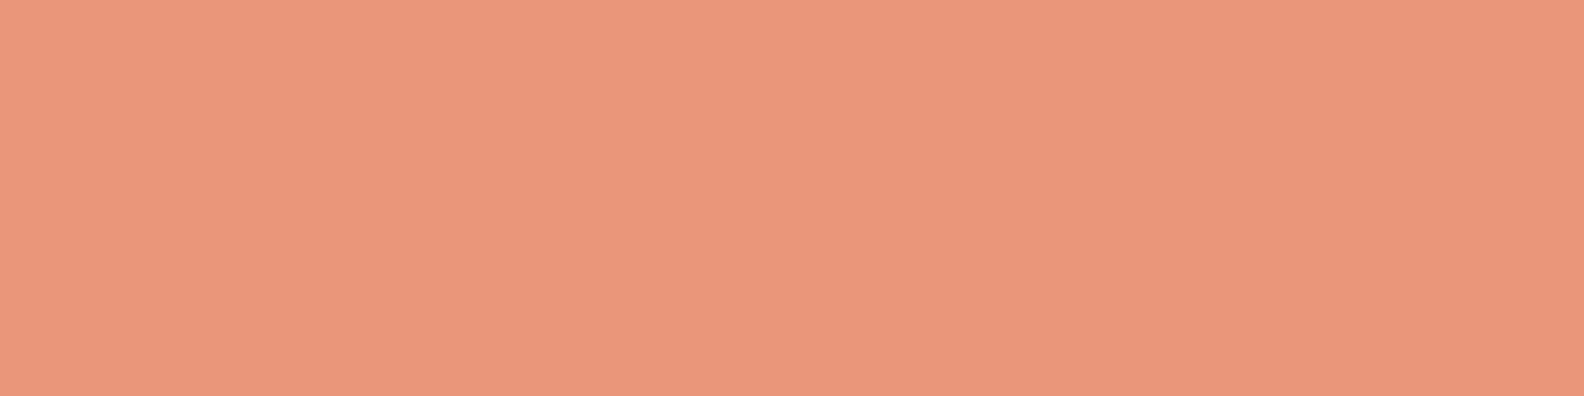 1584x396 Dark Salmon Solid Color Background